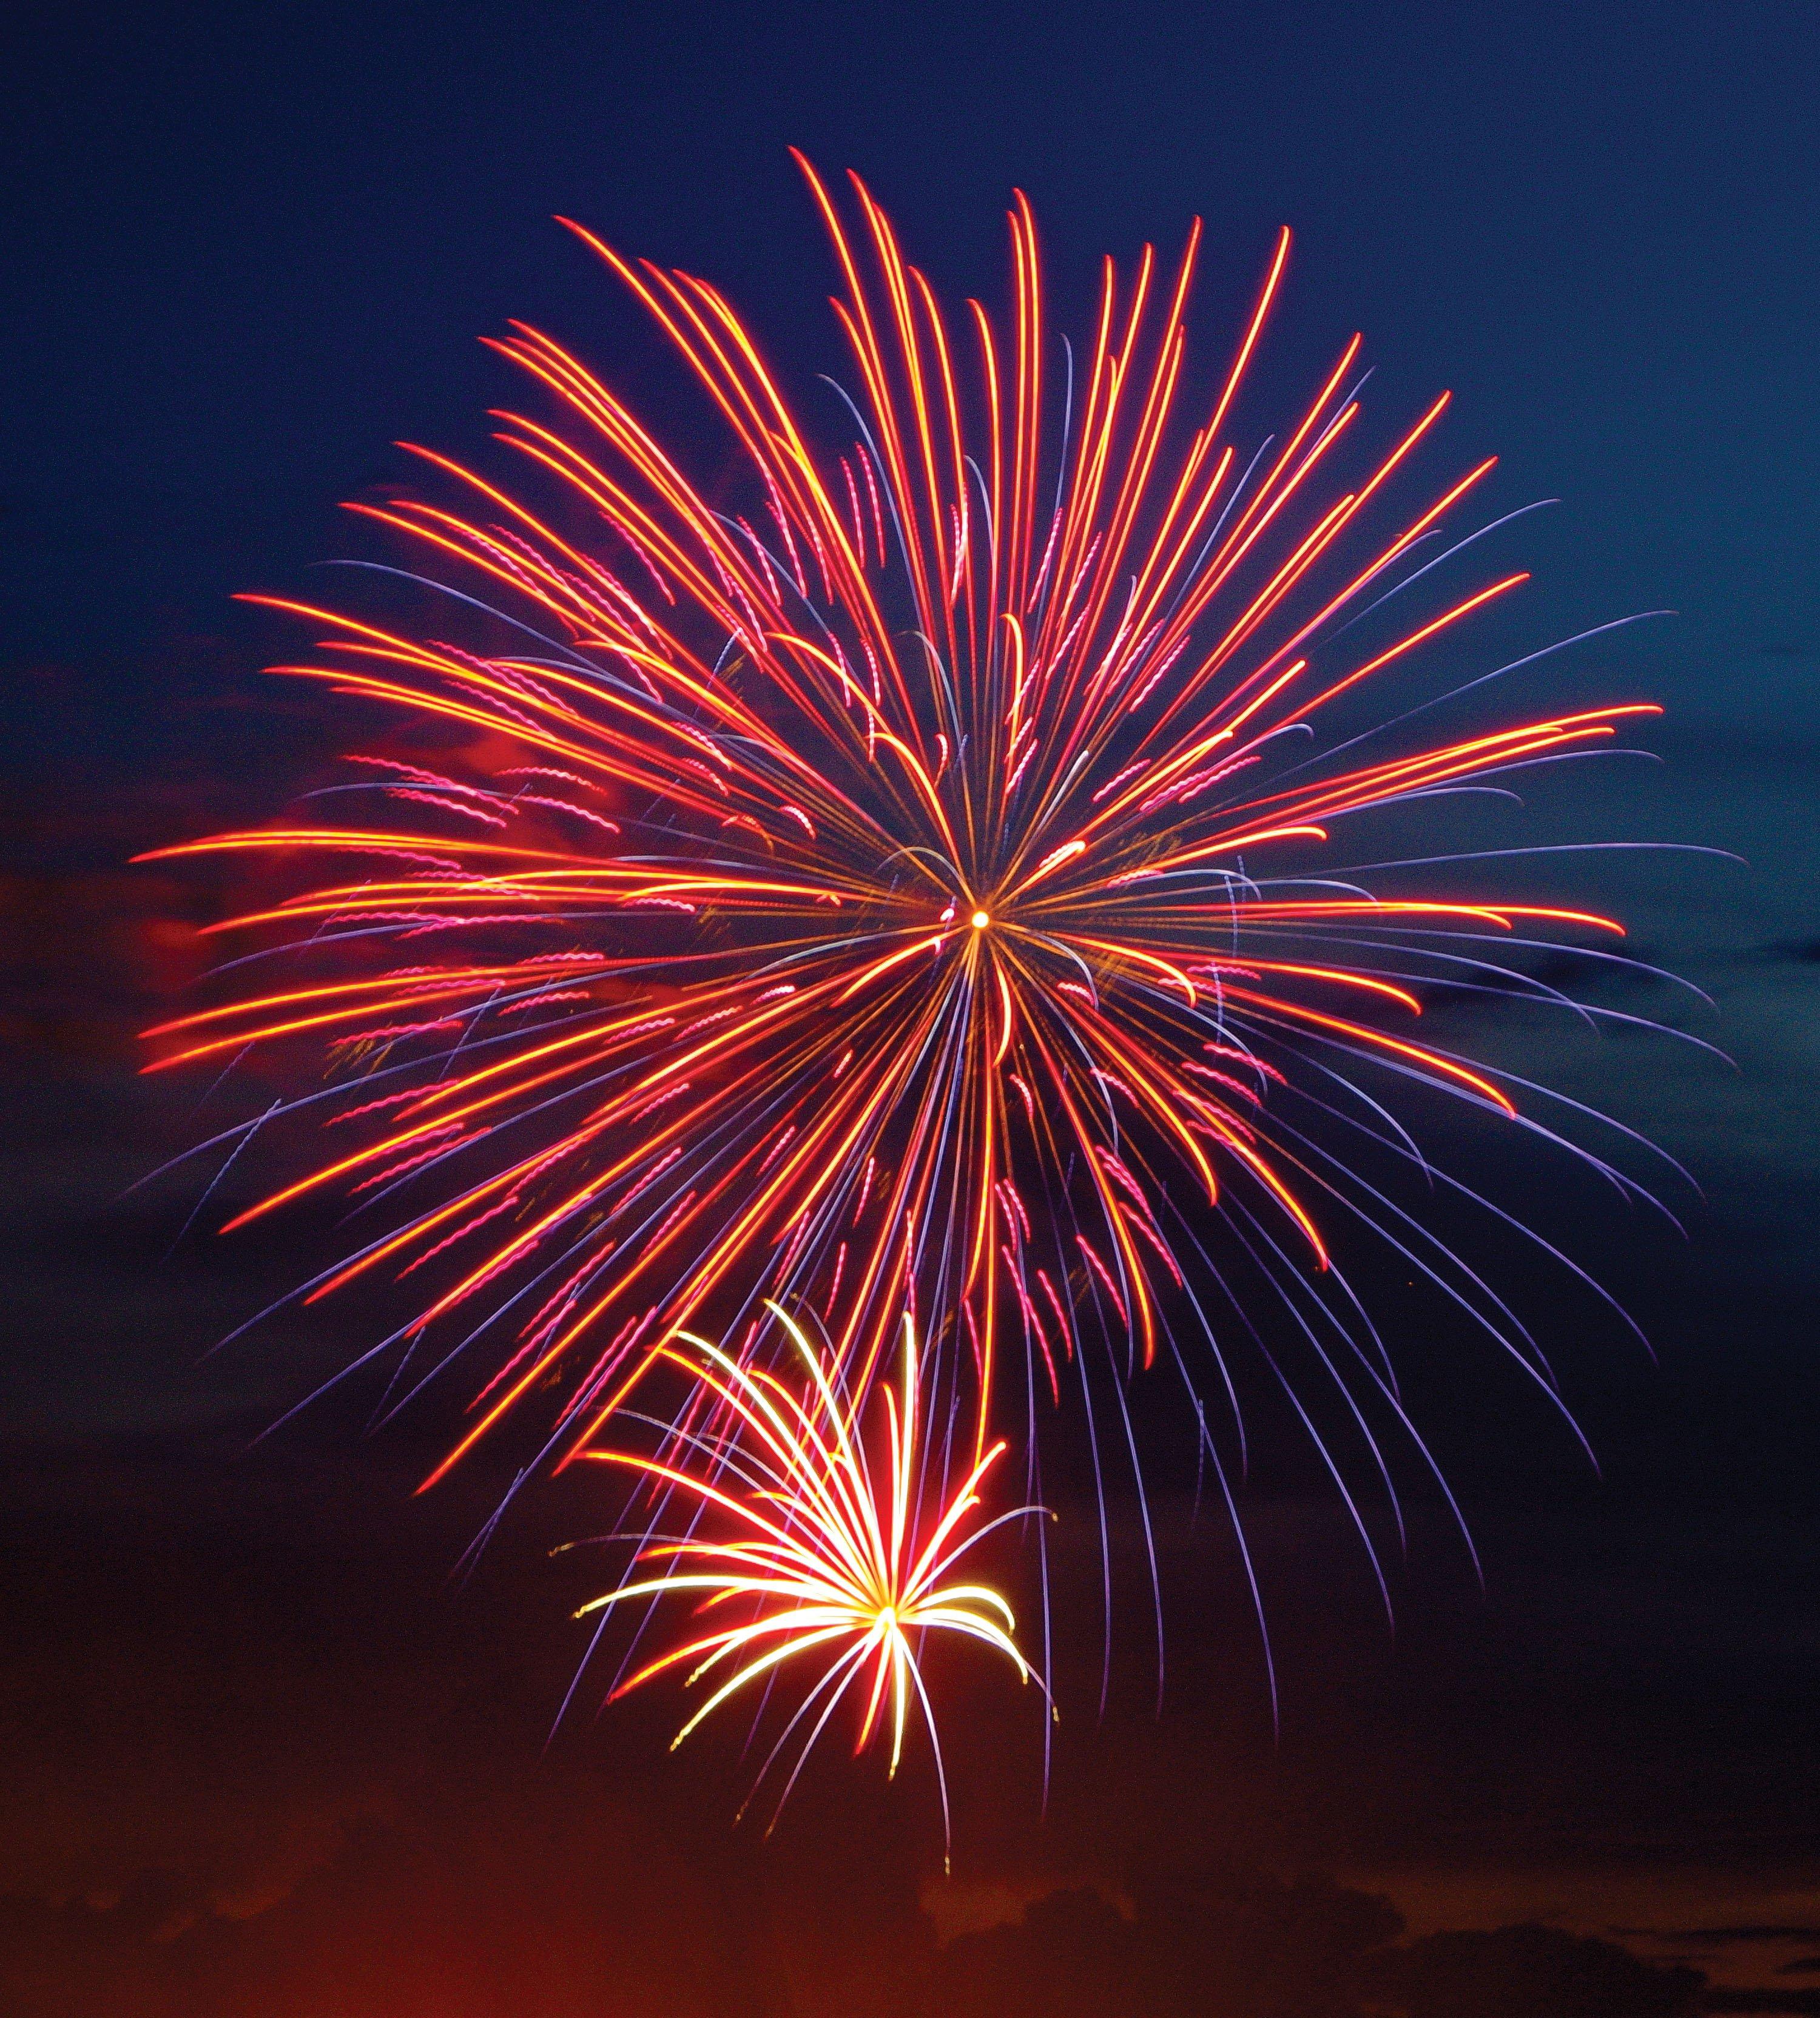 Fireworks 2019 12